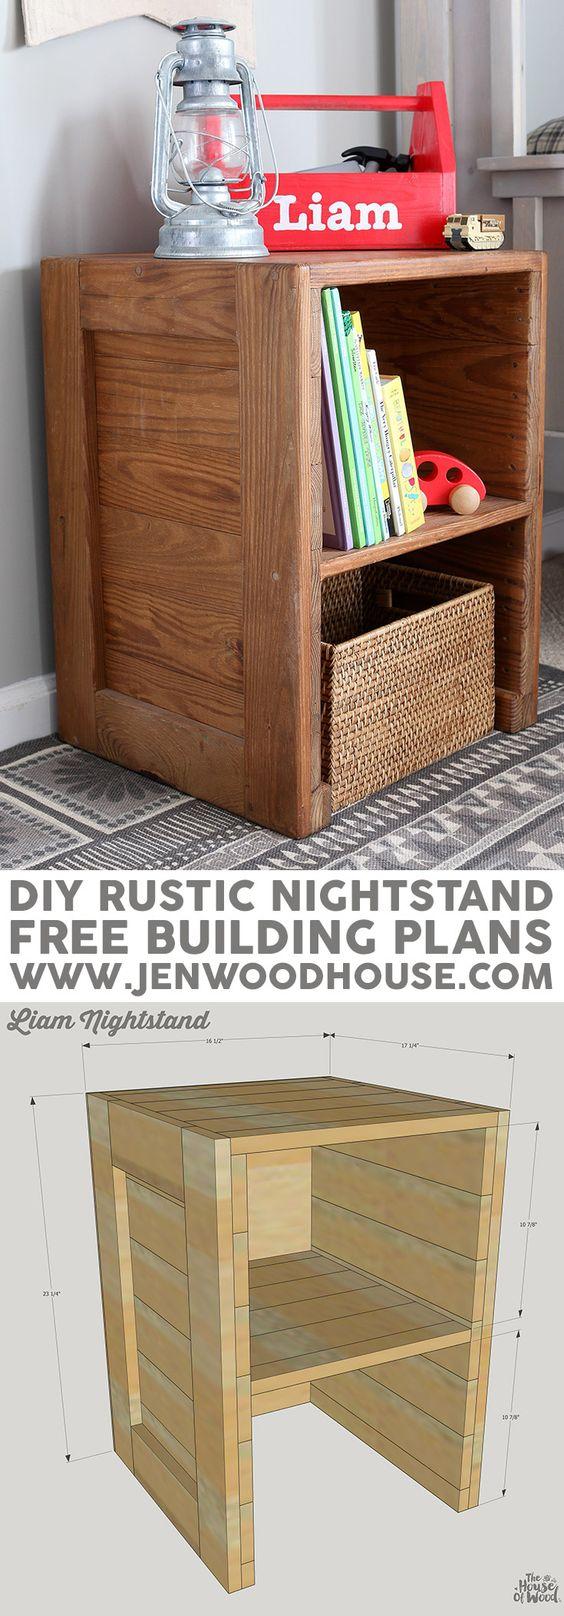 free plans diy rustic nightstand rustic nightstand rustic and how